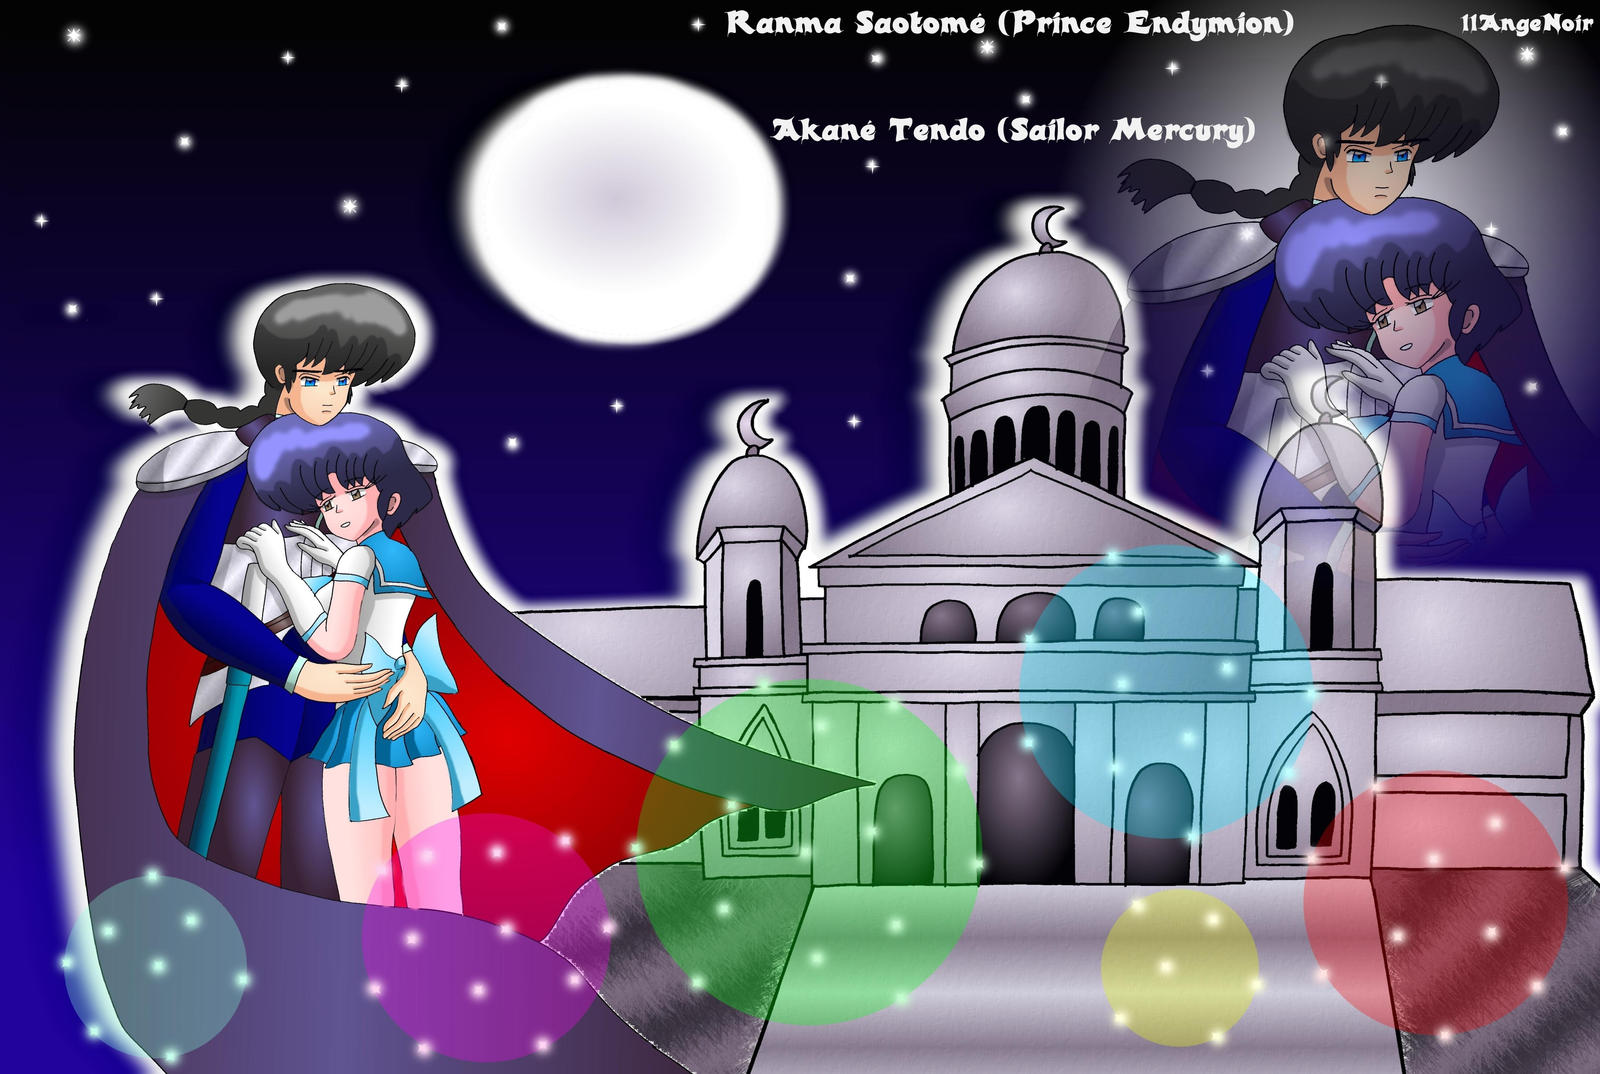 Sailor Moon Ranma Crossover Fanart Wallpaper By 11angenoir5 On